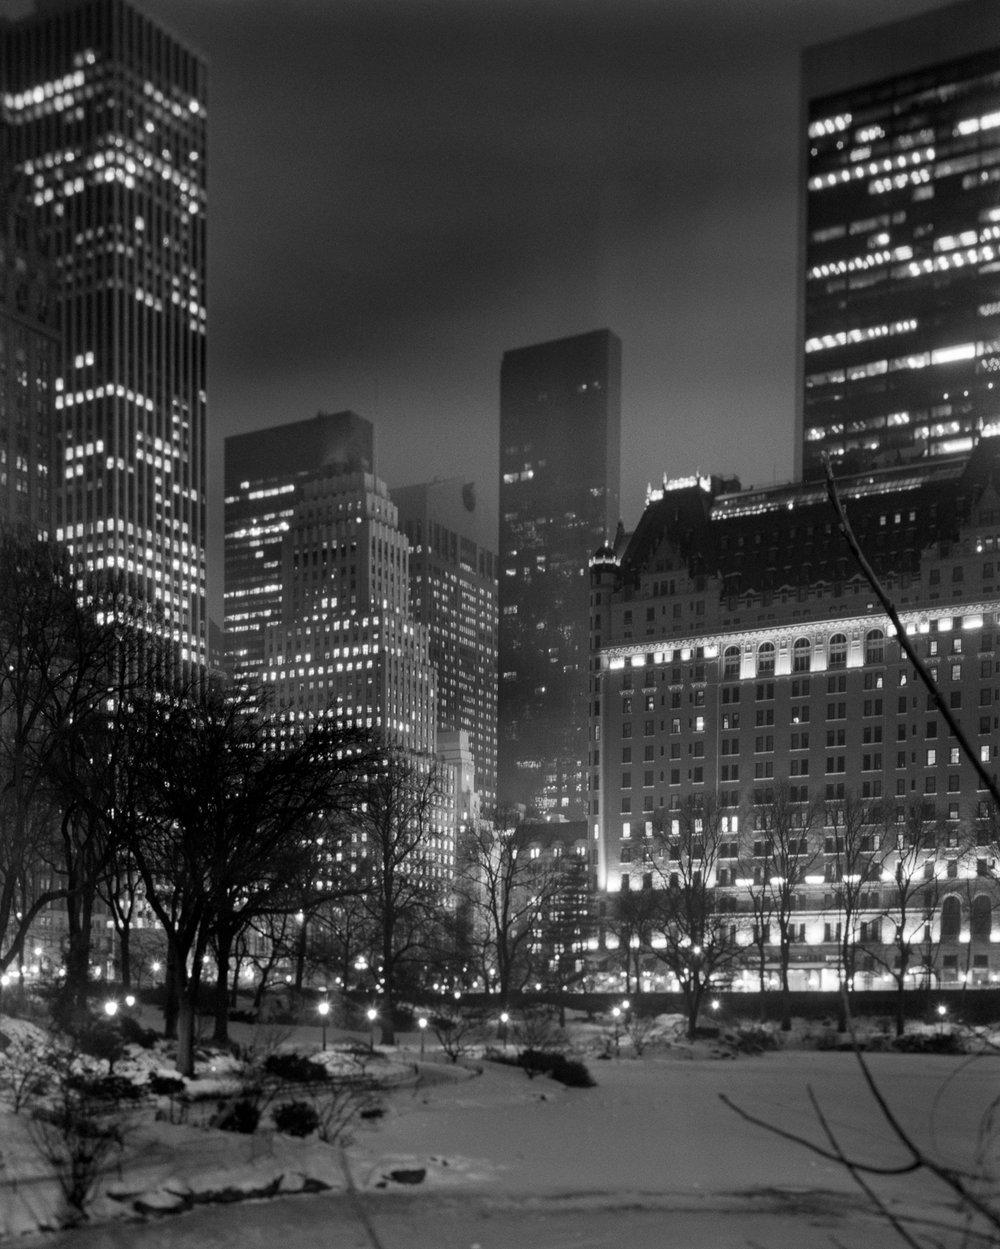 City2_W.jpg